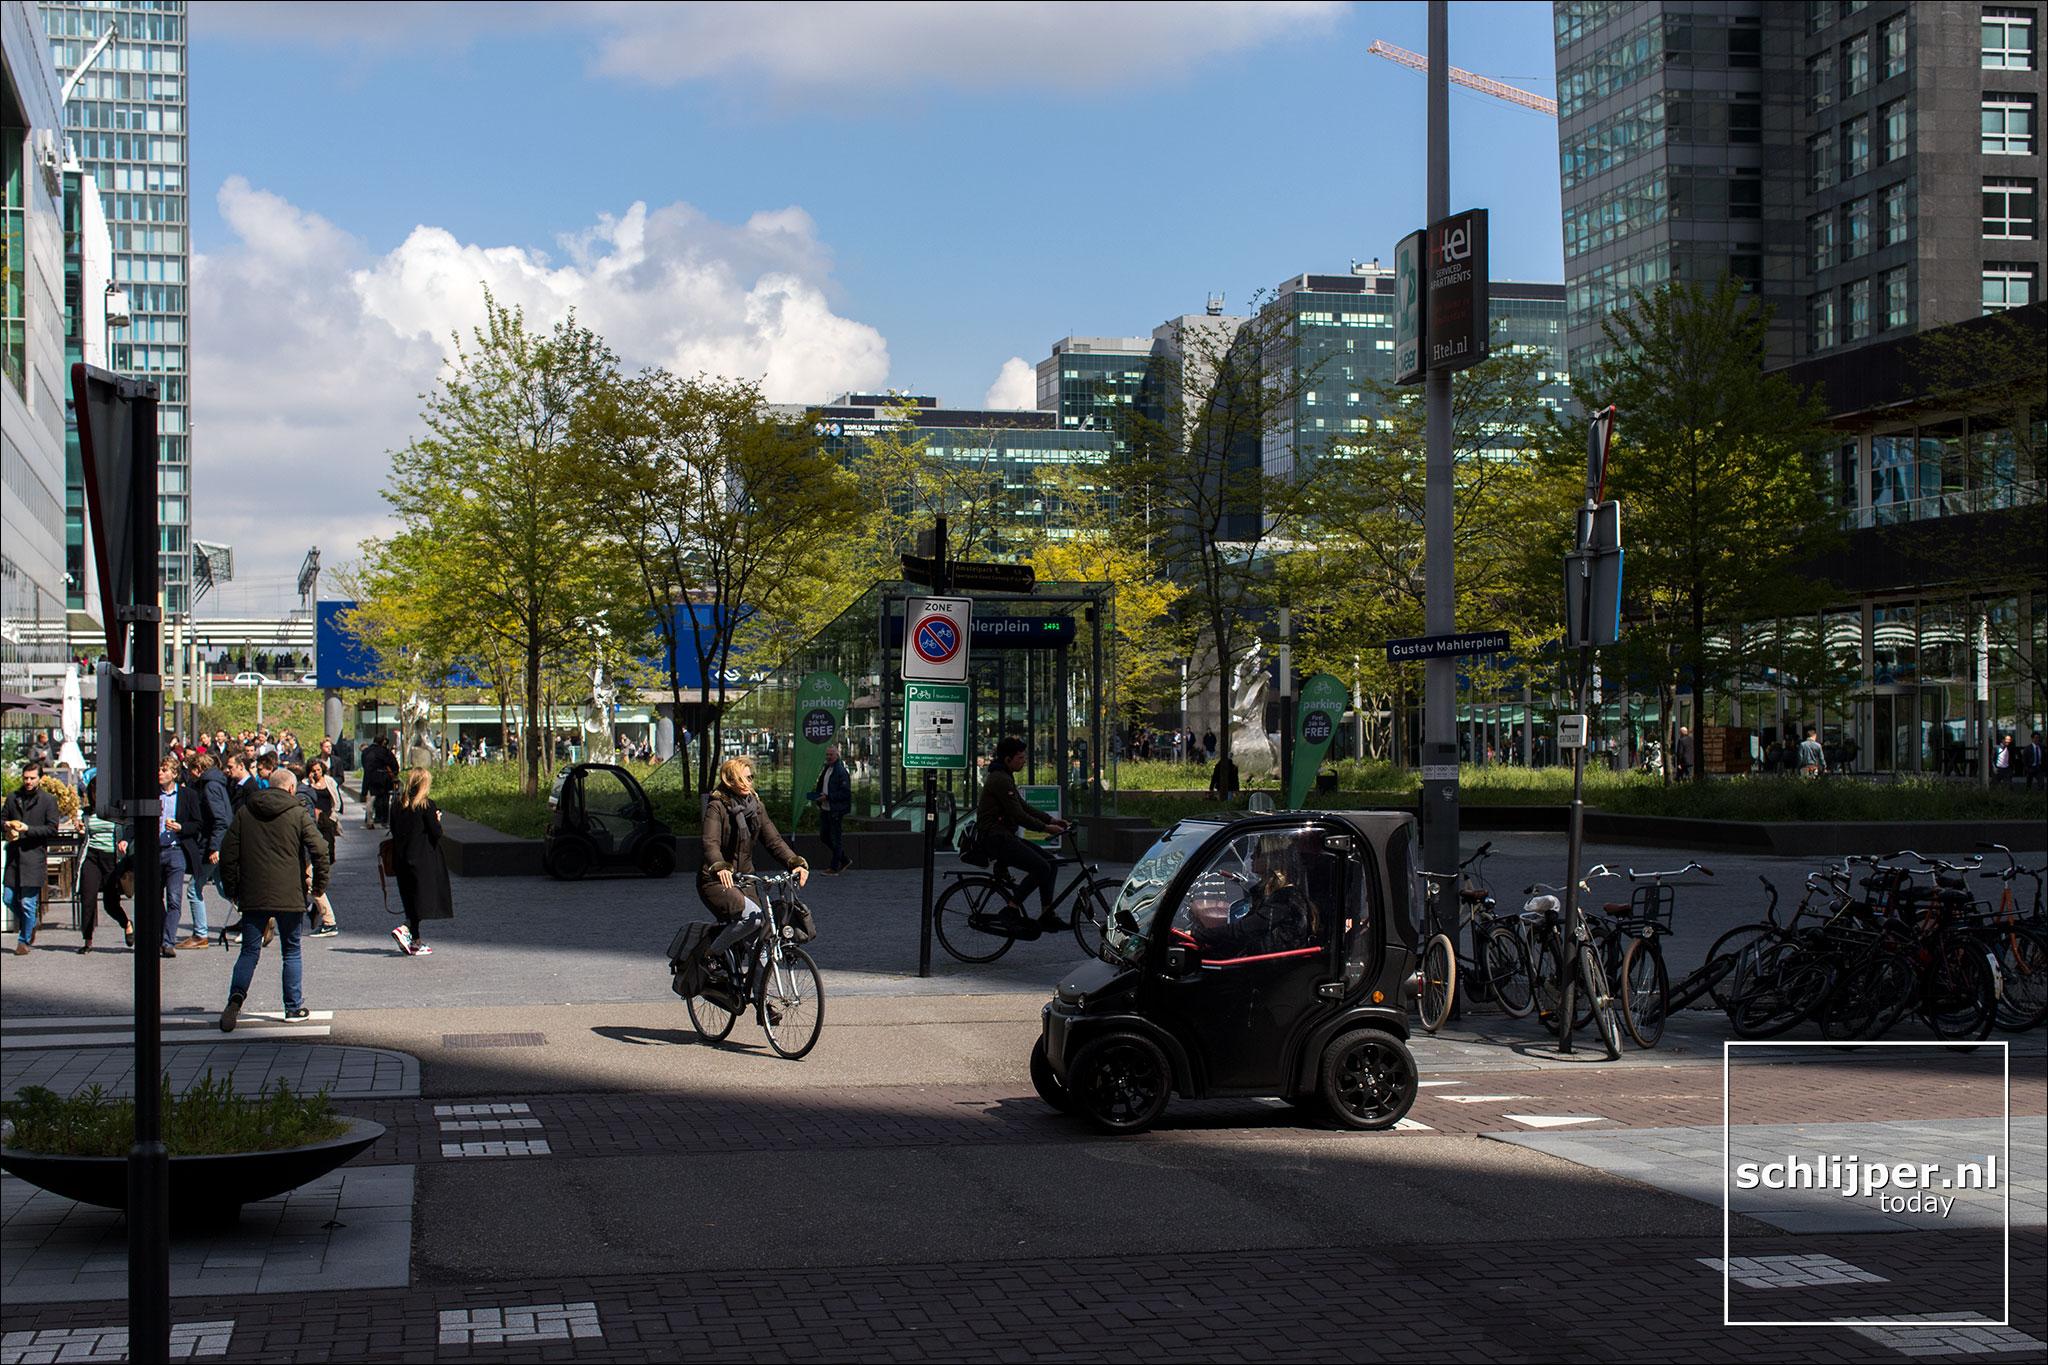 Nederland, Amsterdam, 9 mei 2019